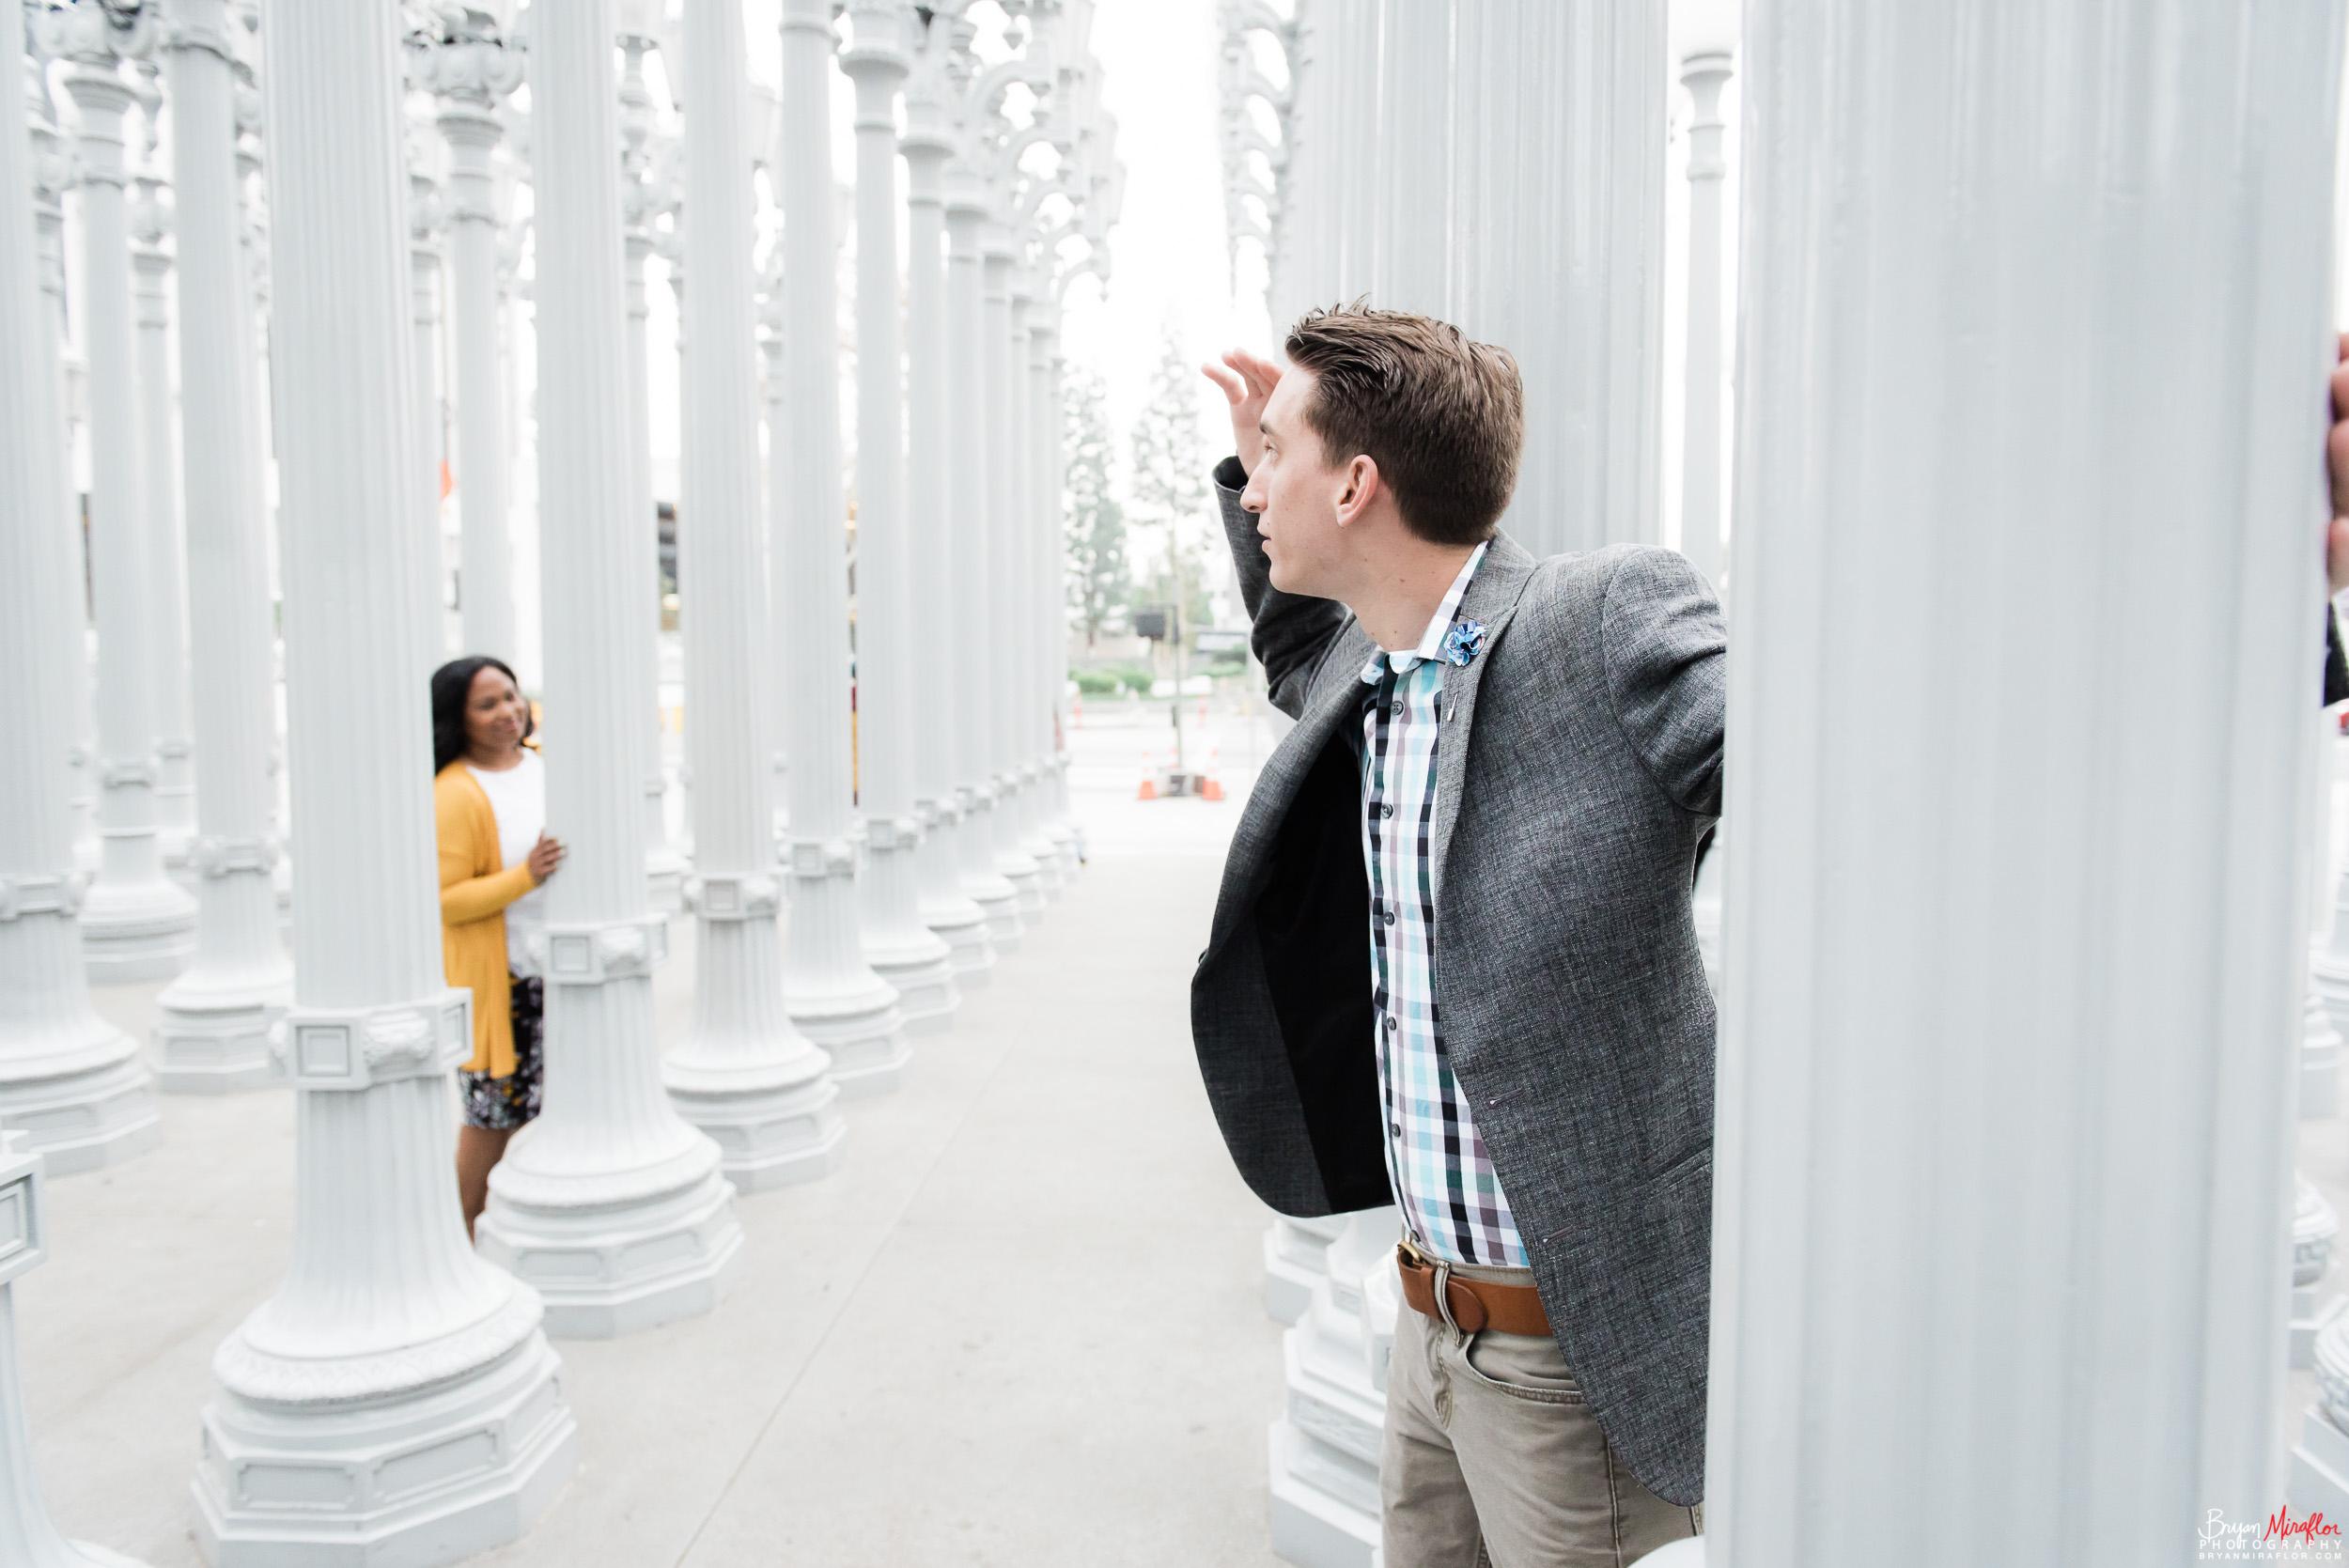 Bryan-Miraflor-Photography-Vanessa-Tommy-LACMA-DTLA-Engagement-Photoshoot-20161210-113.jpg